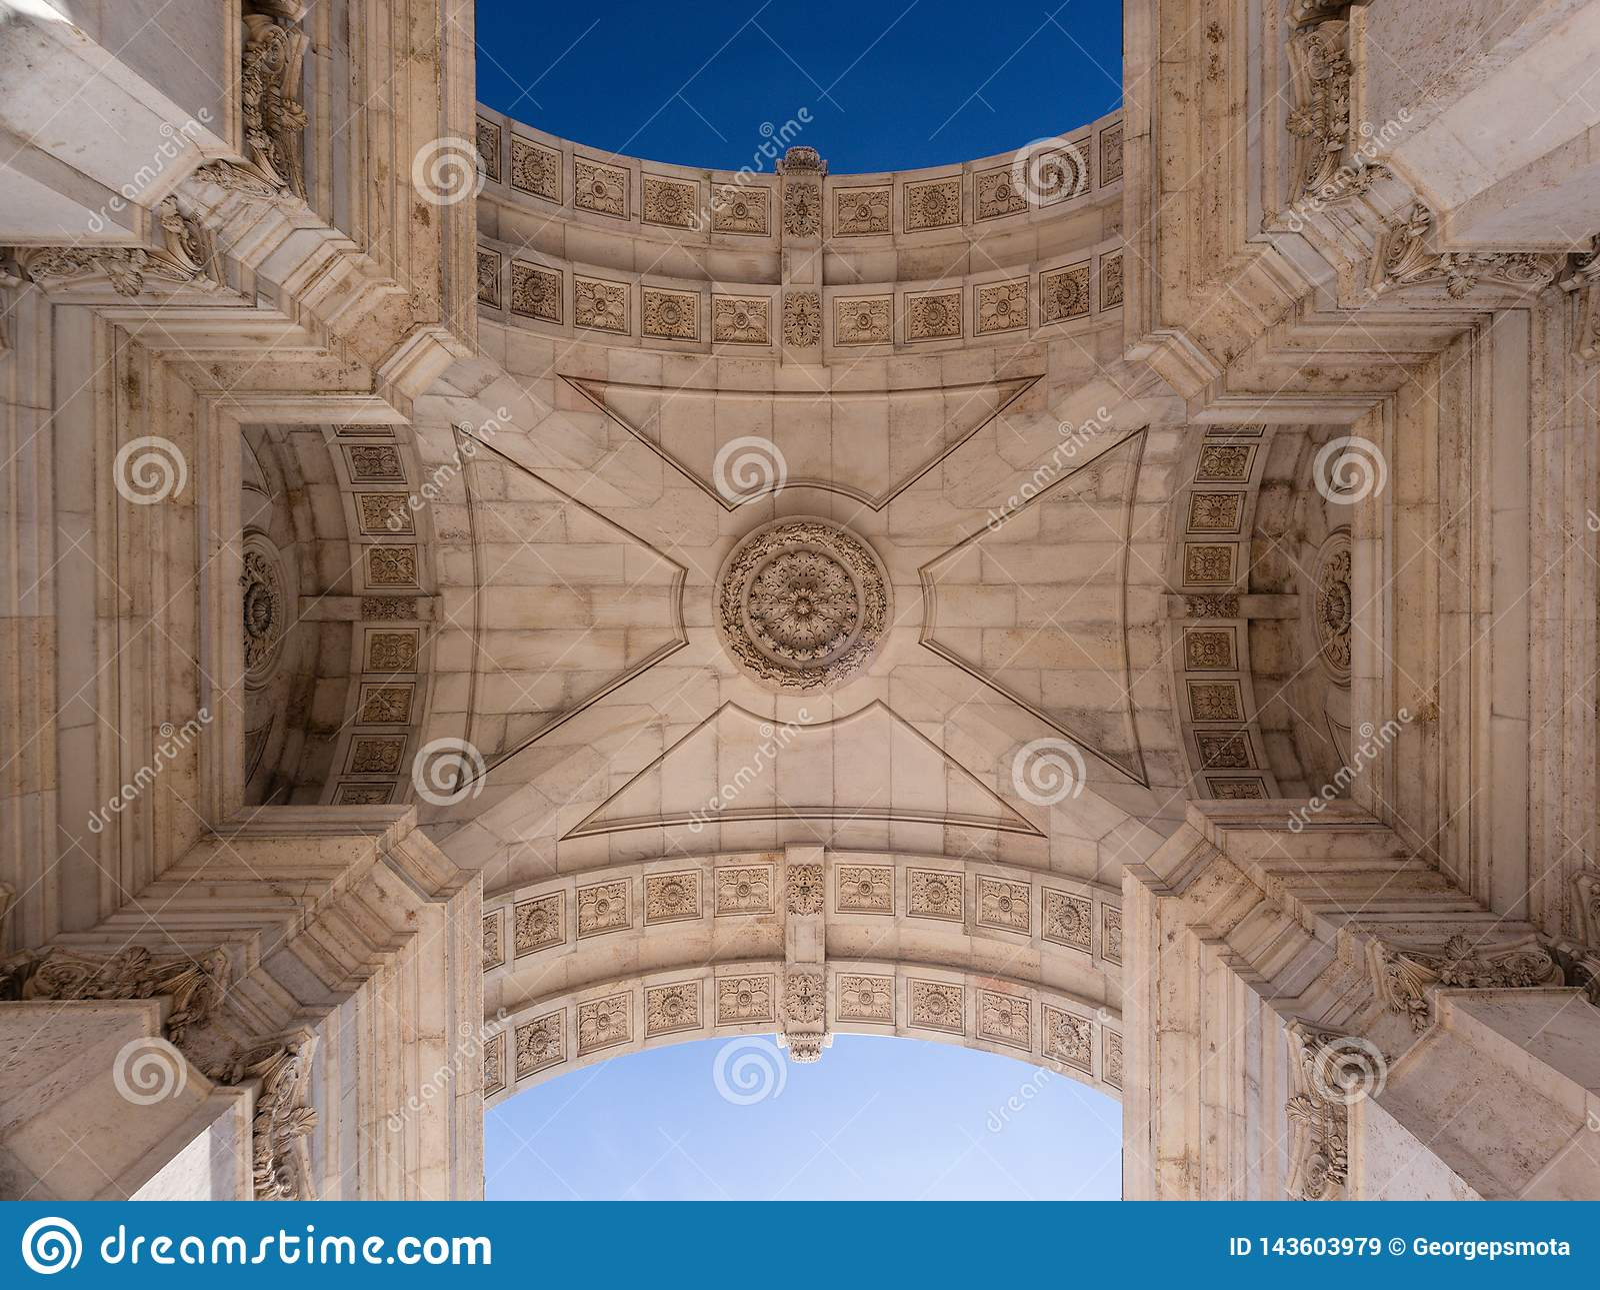 Prachtig plafond van de Triomfantelijke Boog Arco DA Rua Augusta in de Handel vierkante Praça do Comercio in Lissabon, Portugal